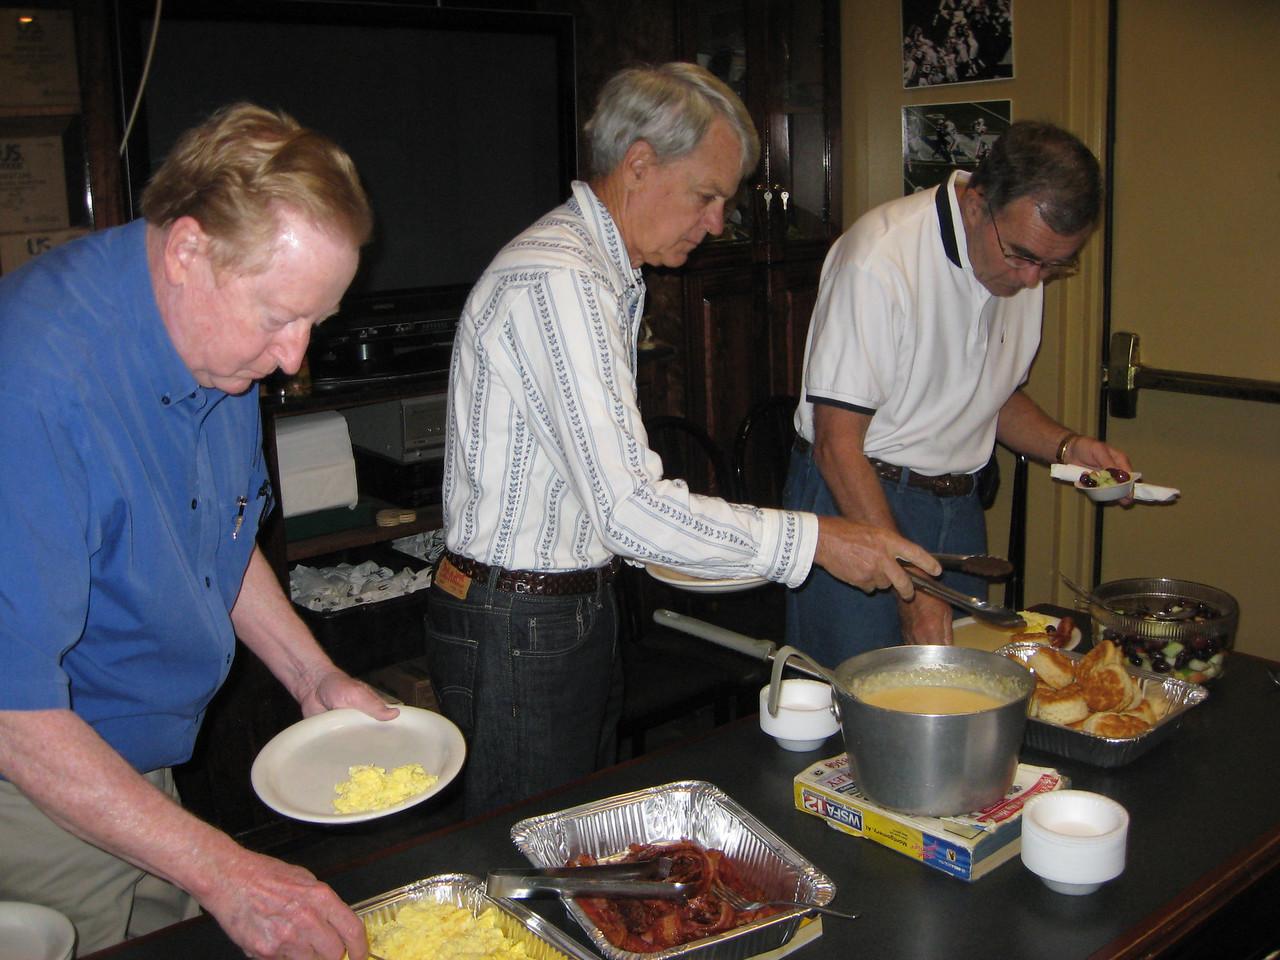 Dan Younger, George Wilson, Randy Johnson